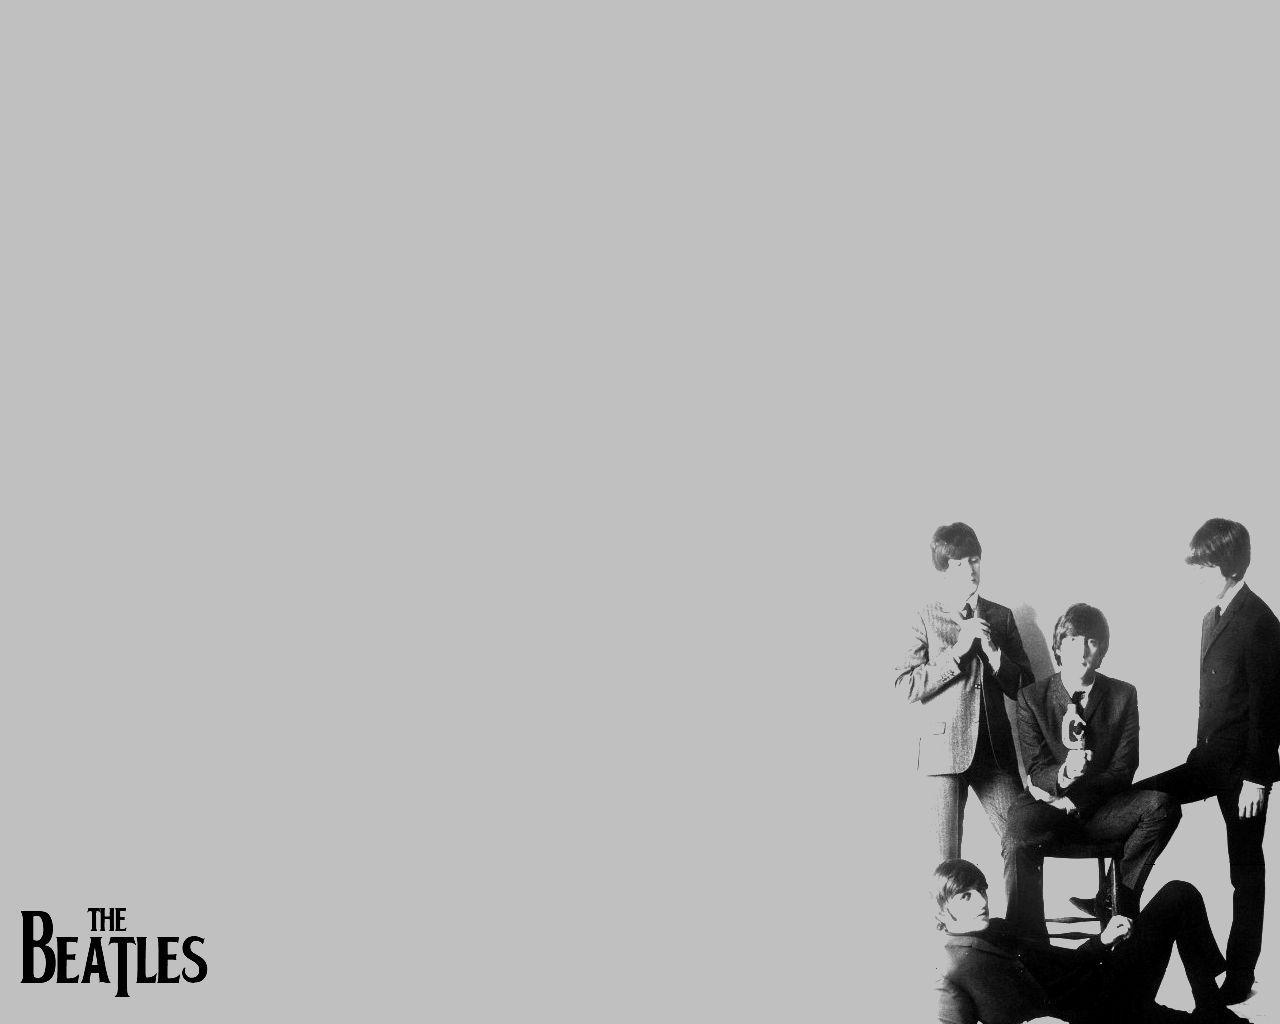 The Beatles Wallpaper 1280x1024